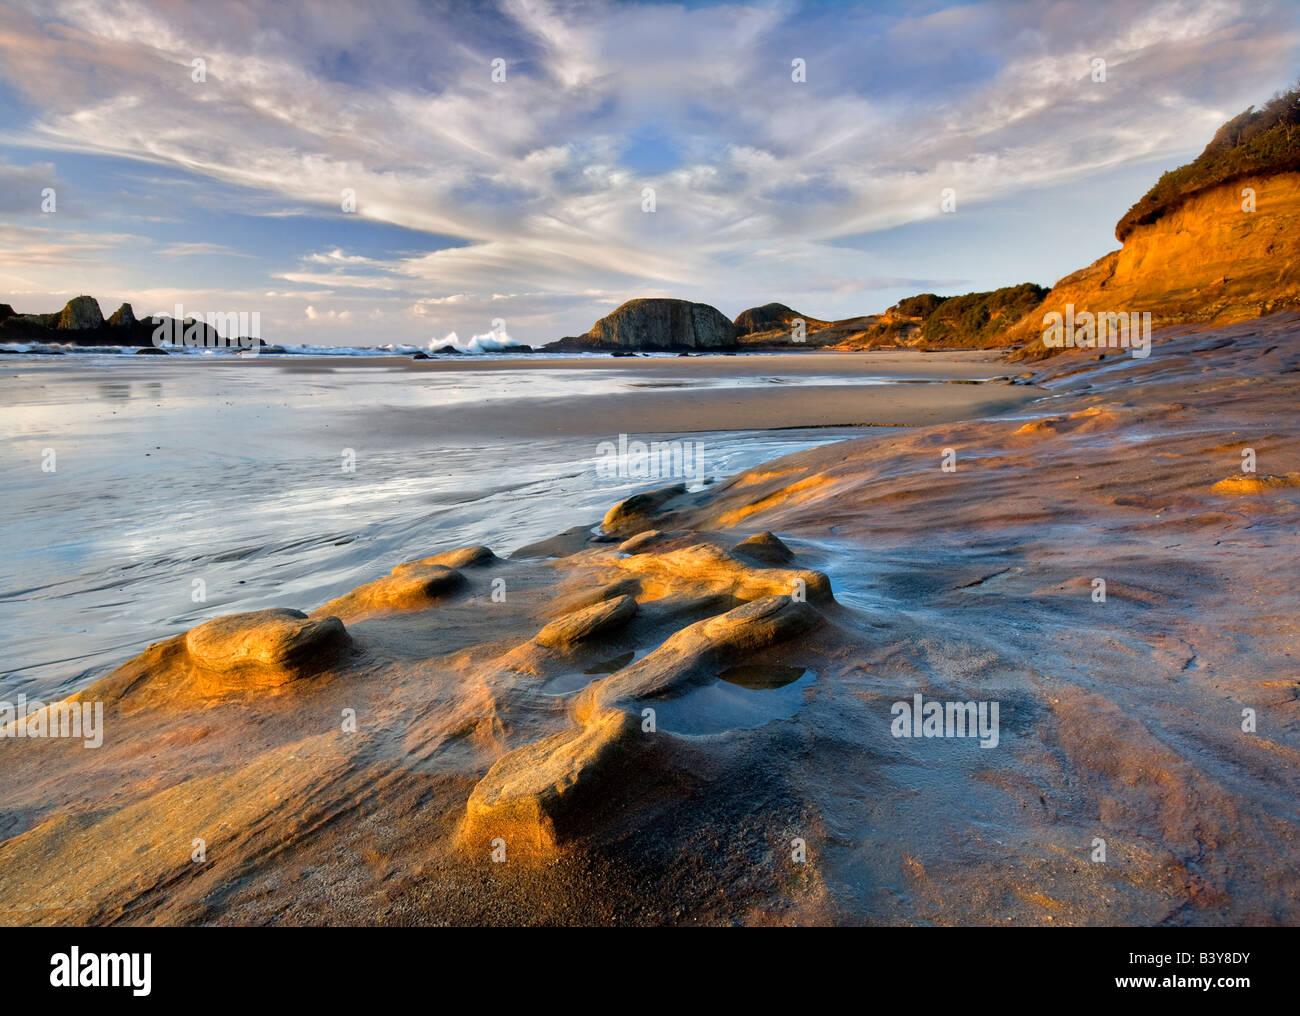 sandstone rock structure on shore of Seal Rock Oregon - Stock Image